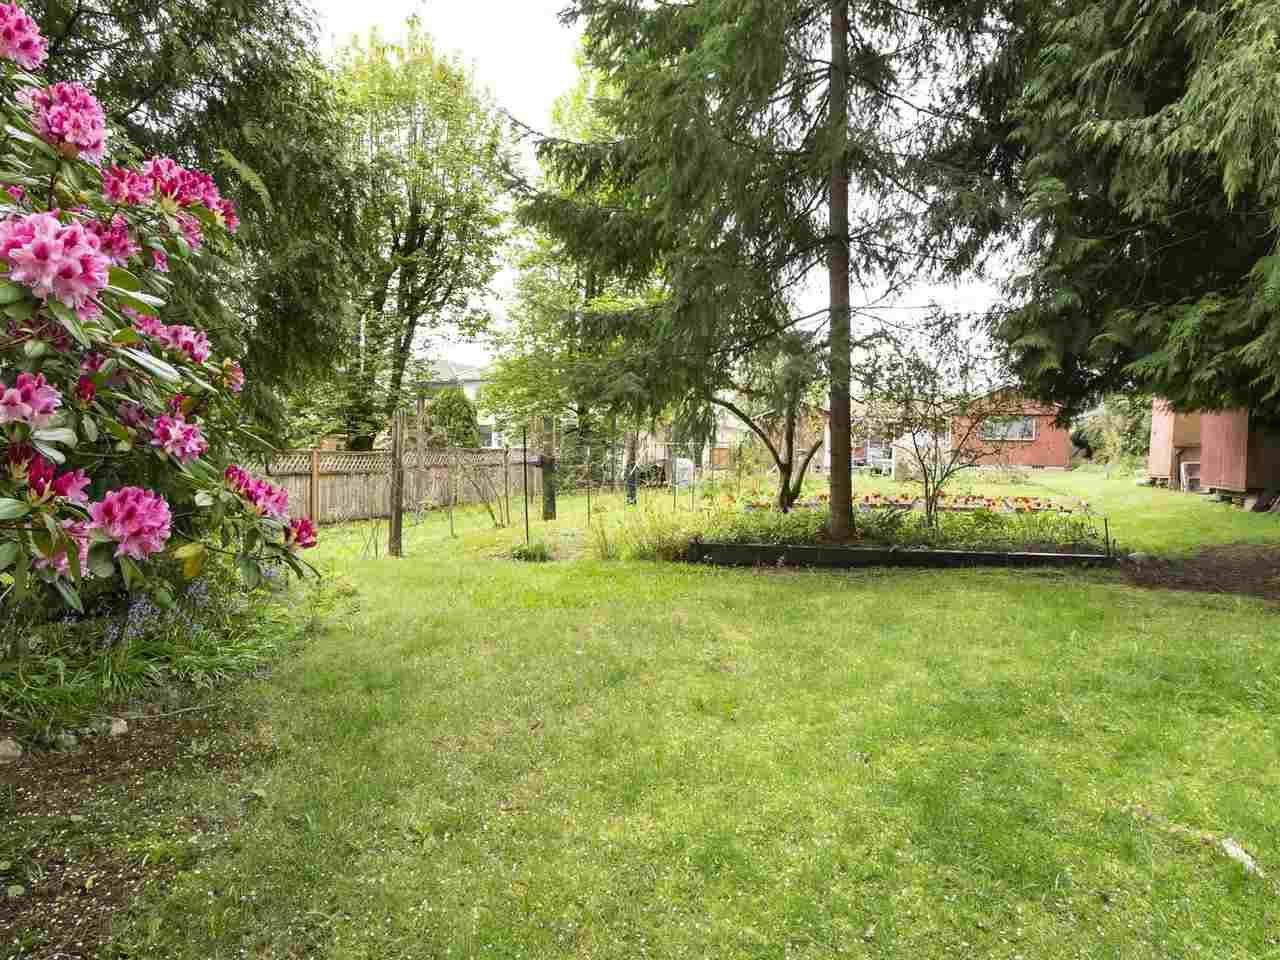 Photo 8: Photos: 1111 REGAN Avenue in Coquitlam: Central Coquitlam House for sale : MLS®# R2452577